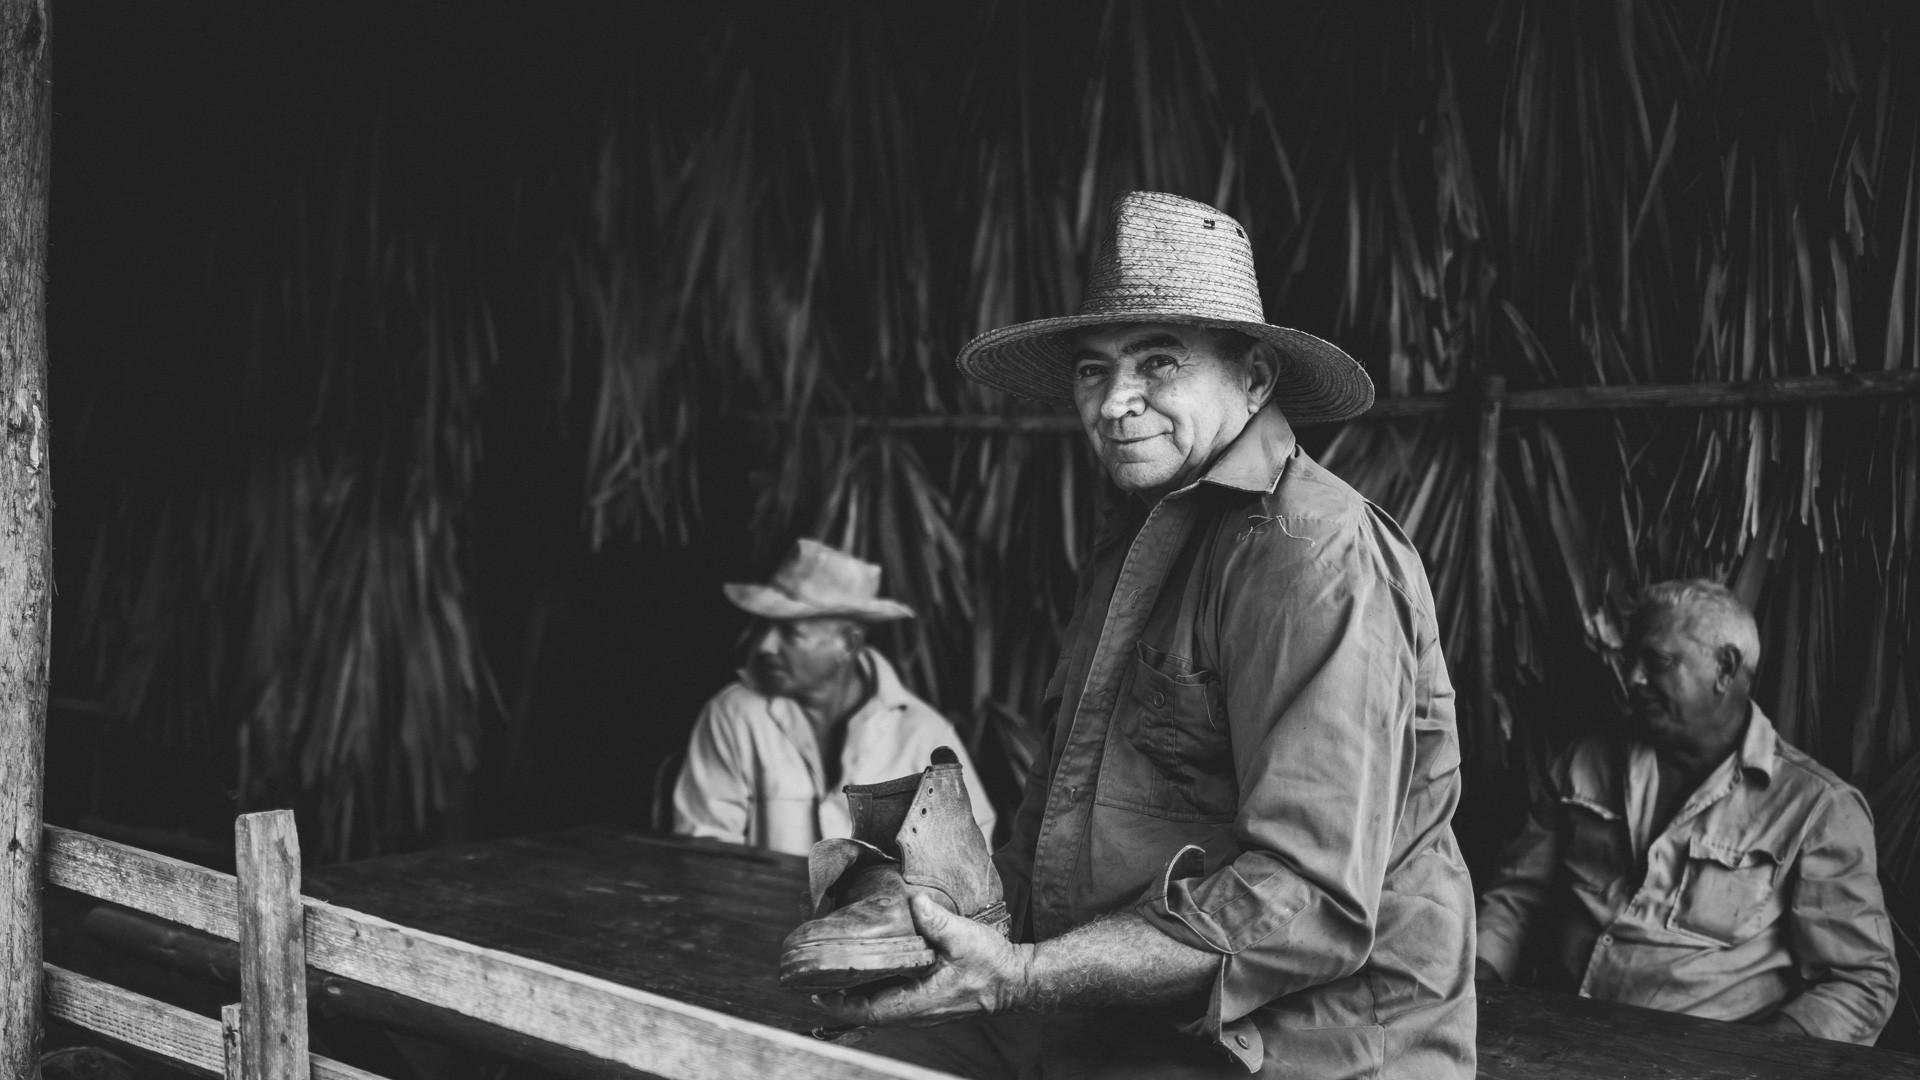 Damien-Dohmen-Photographe-Cuba-11